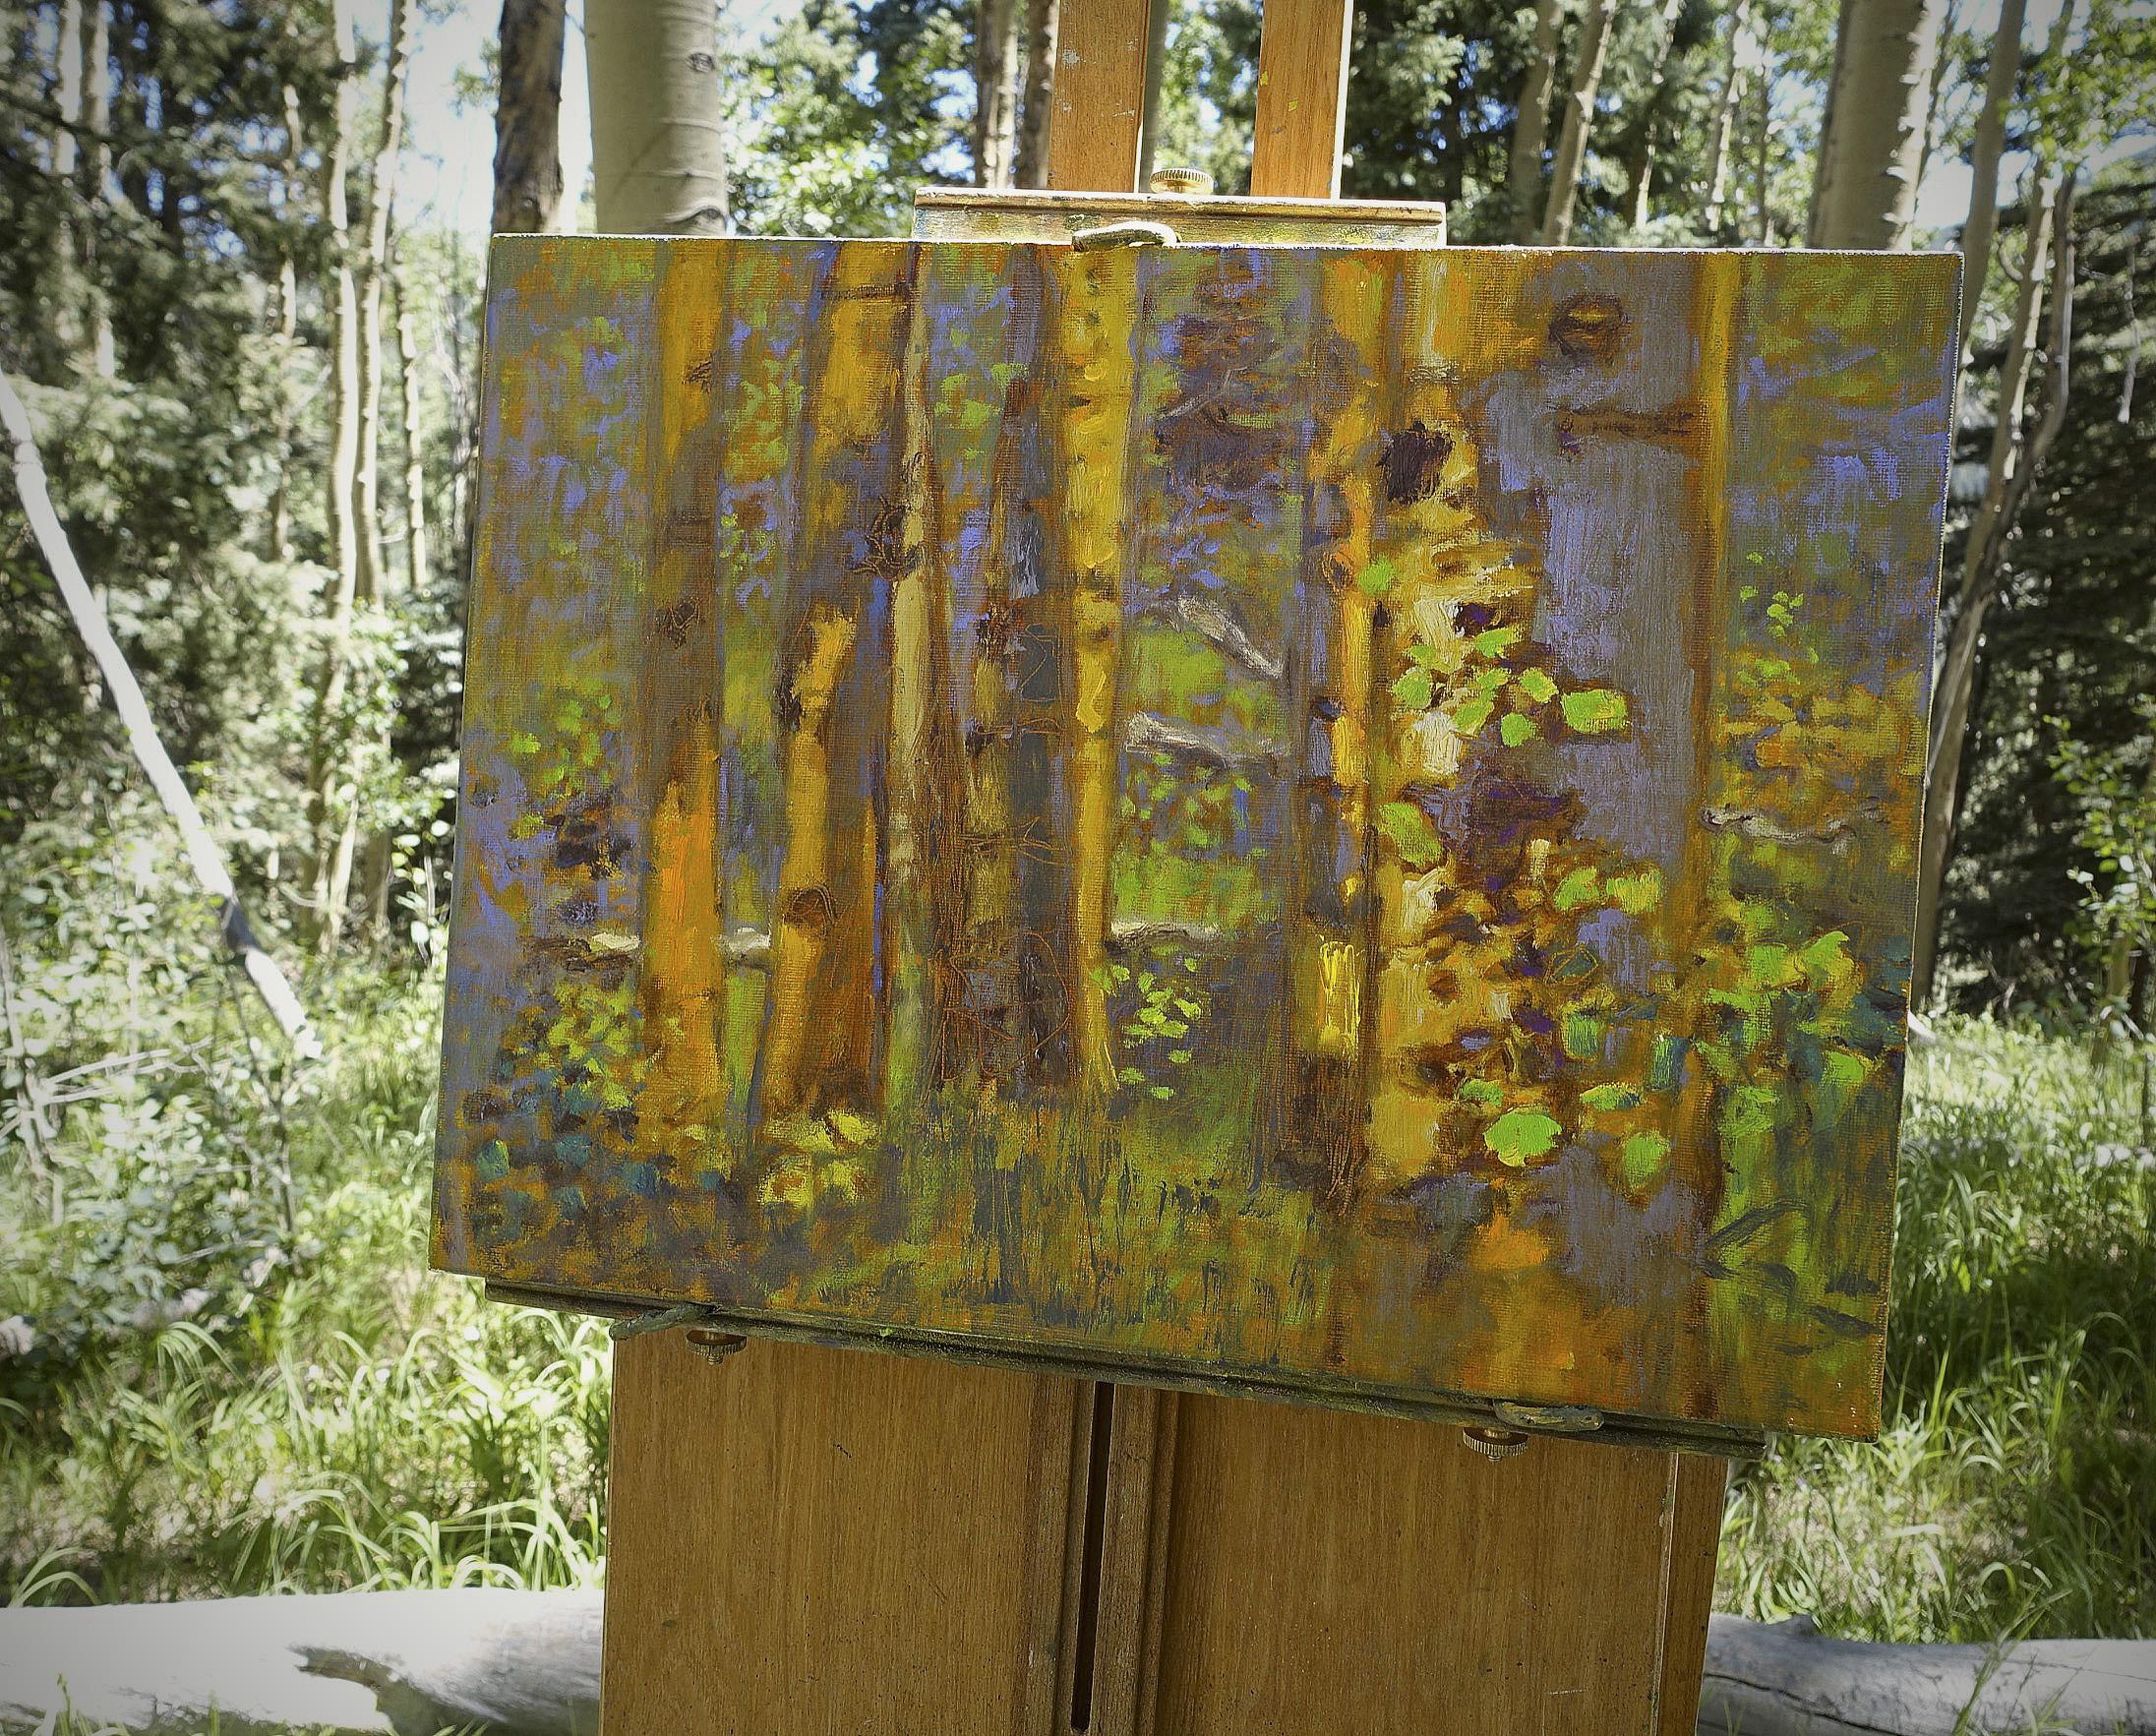 New aspen series in progress up on the mountain